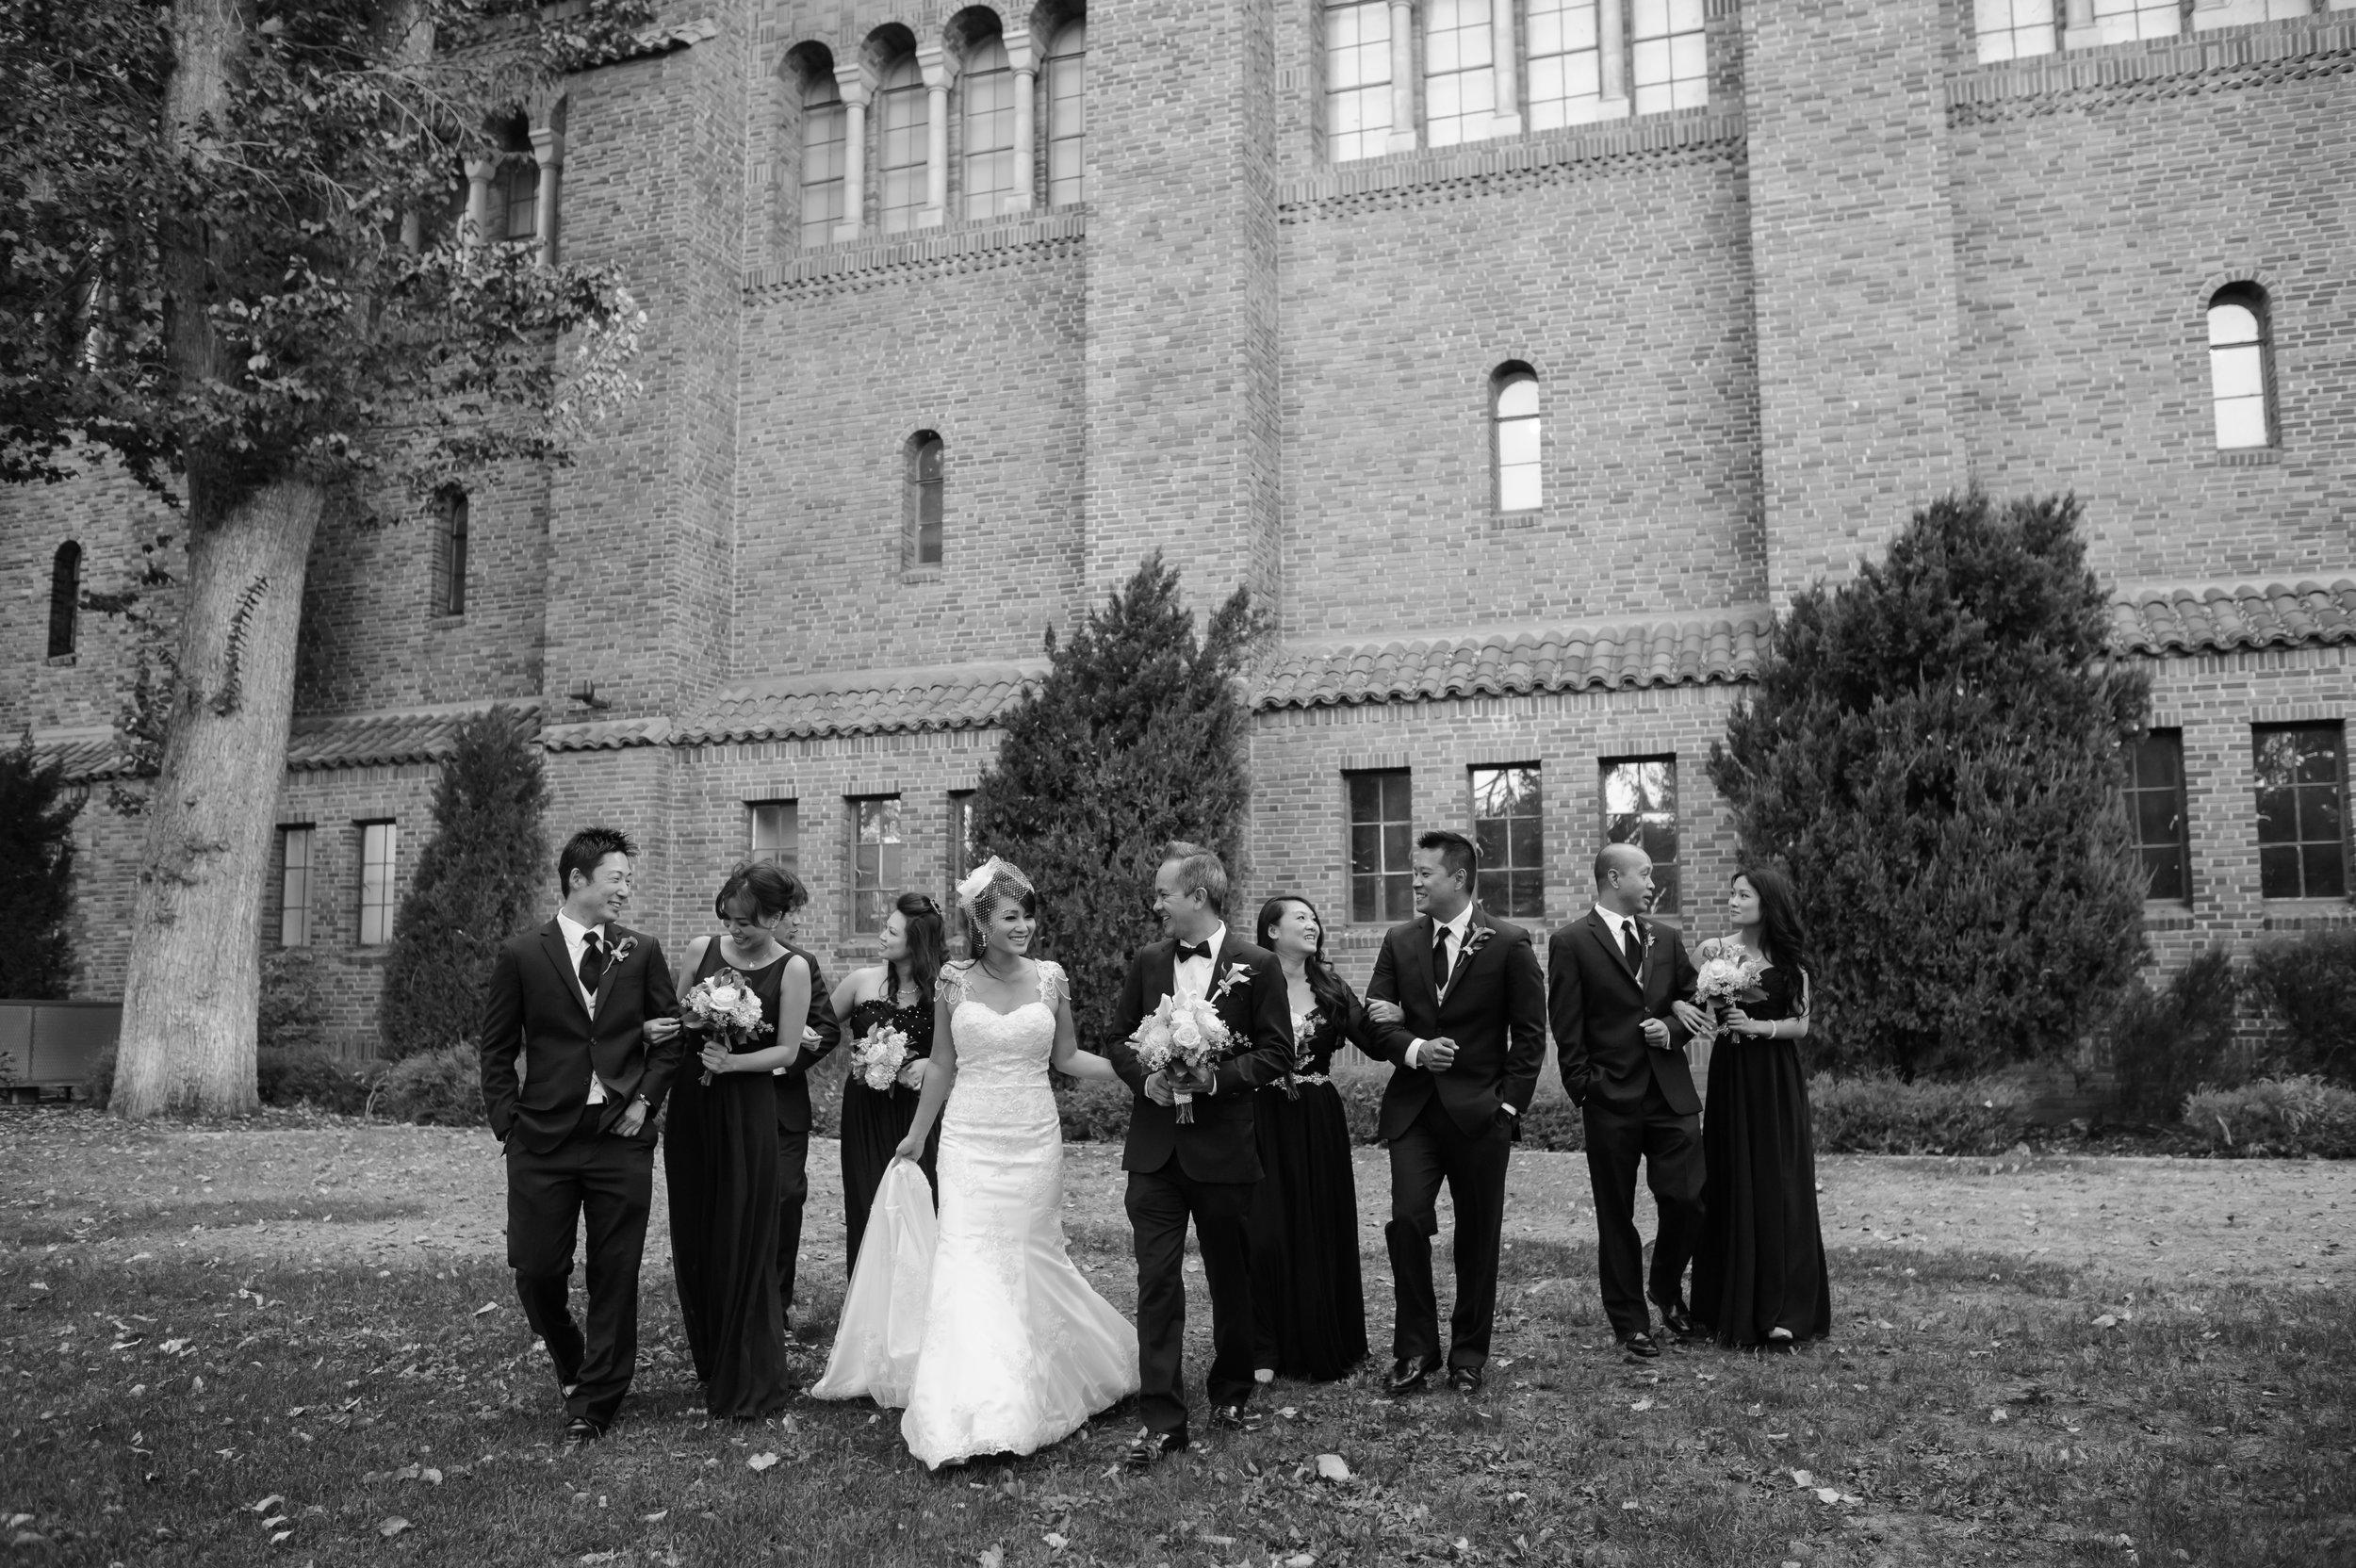 camilla-thuy-062-memorial-auditorium-sacramento-wedding-photographer-katherine-nicole-photography.JPG